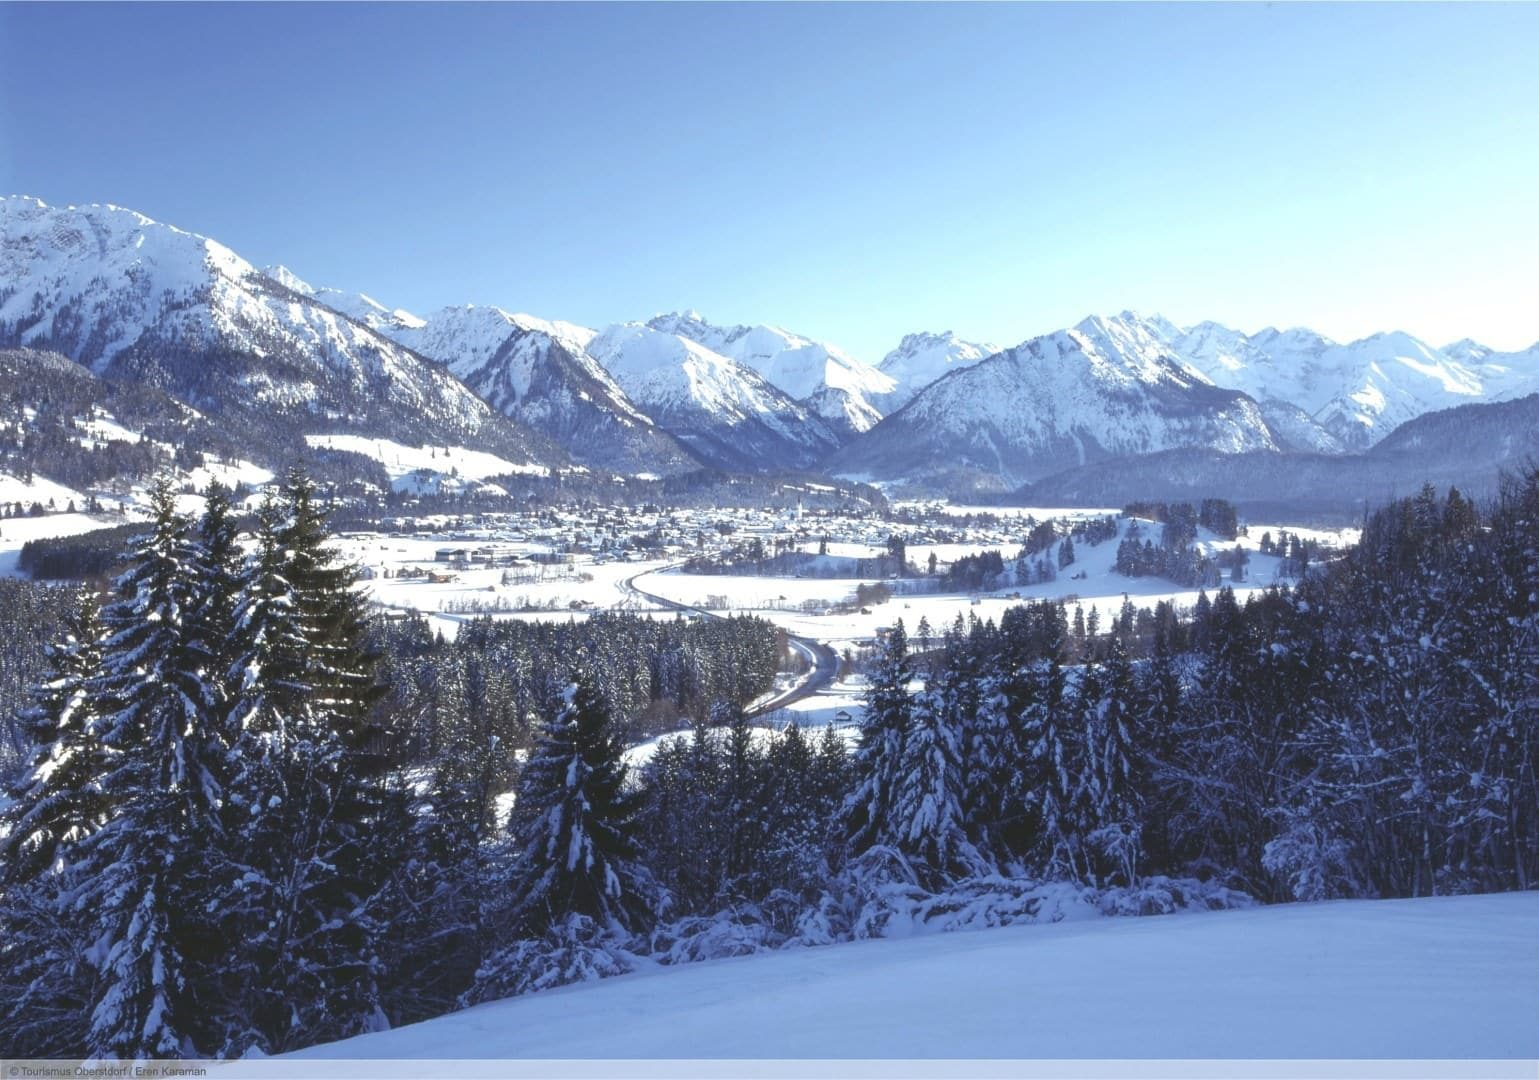 wintersport en aanbiedingen in Oberstdorf